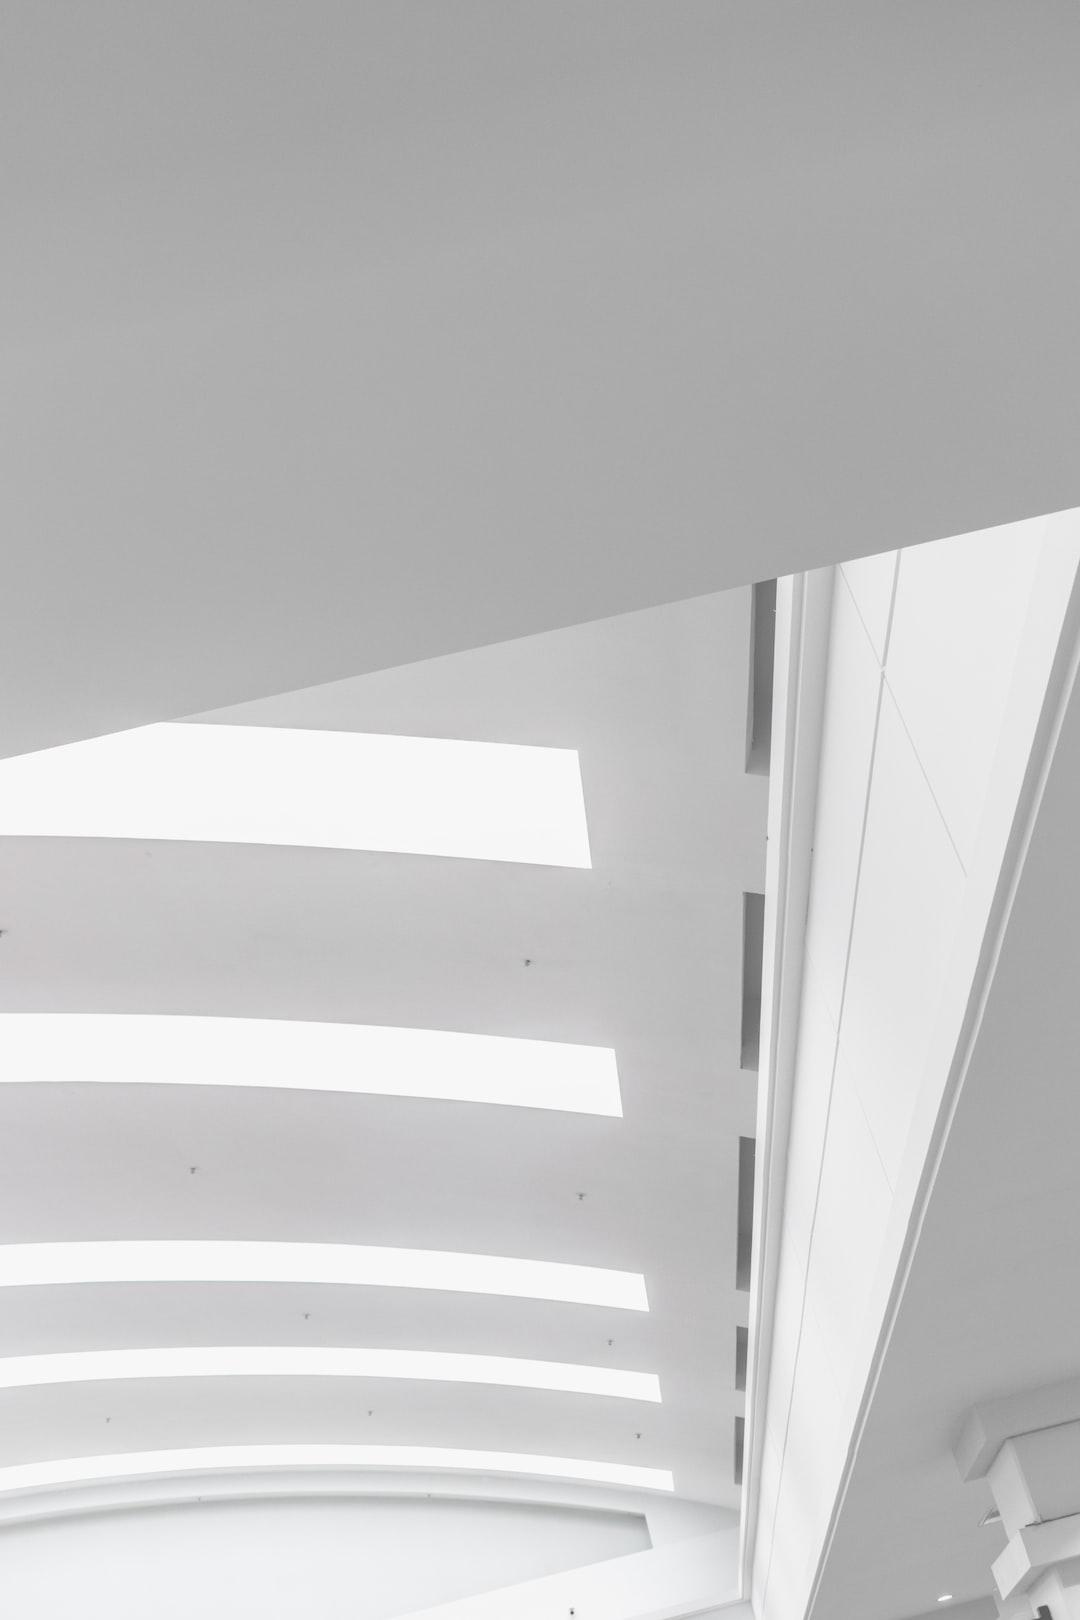 Architecture of Westfield Arkadia